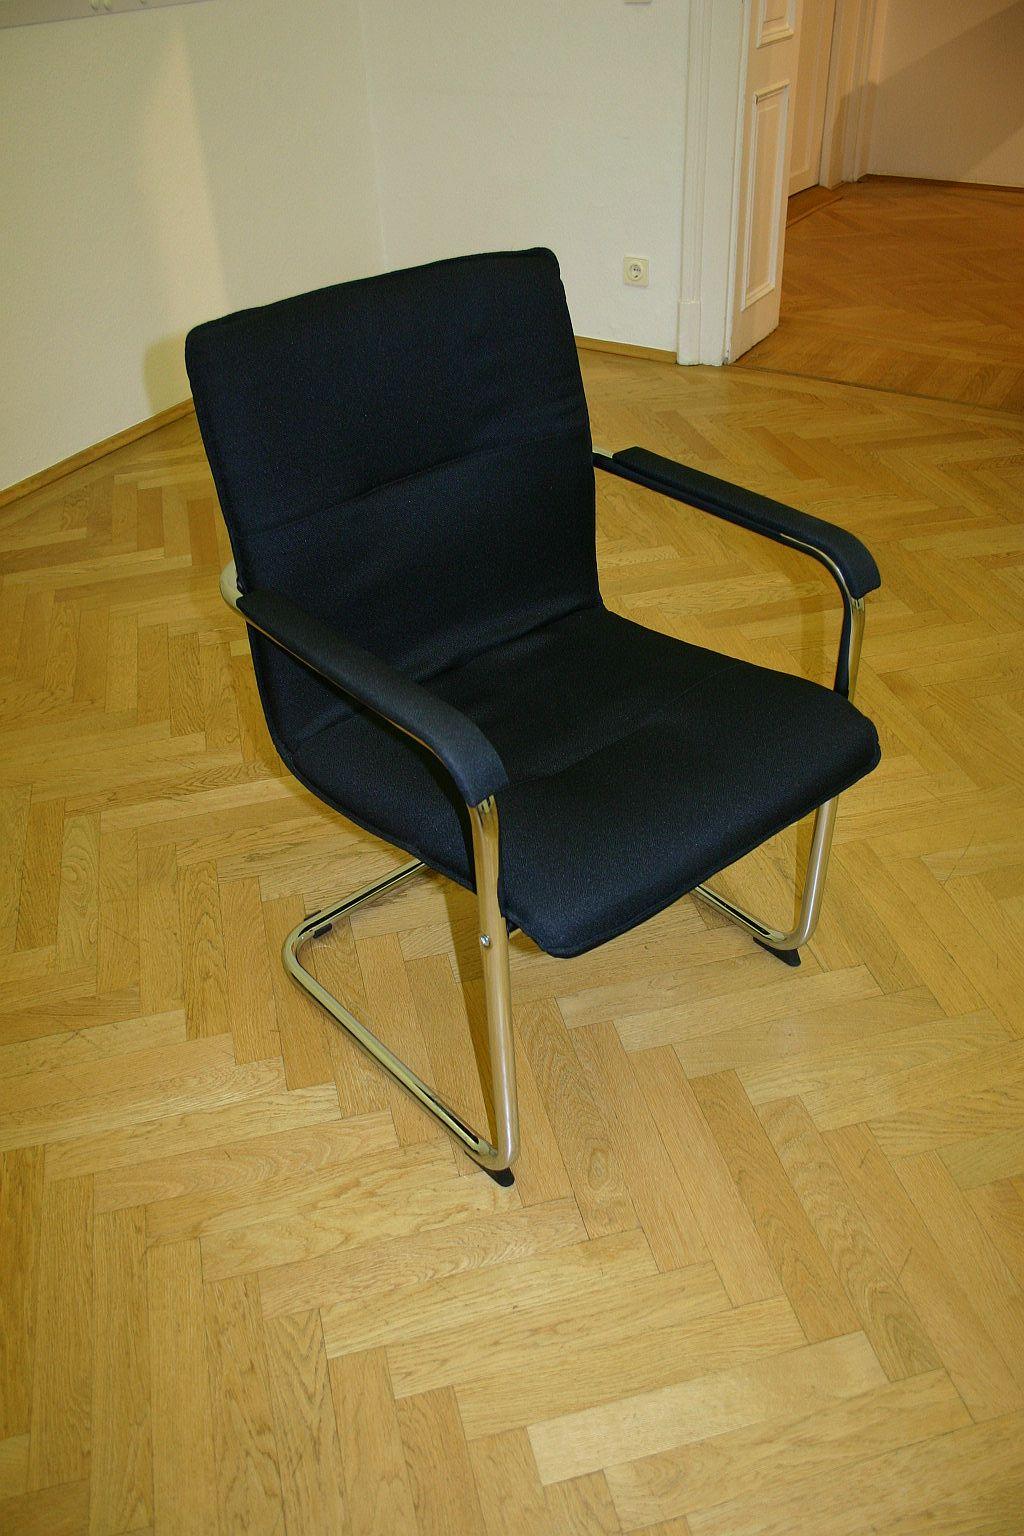 freischwinger in schwarz chrom st hle unsere kategorien. Black Bedroom Furniture Sets. Home Design Ideas